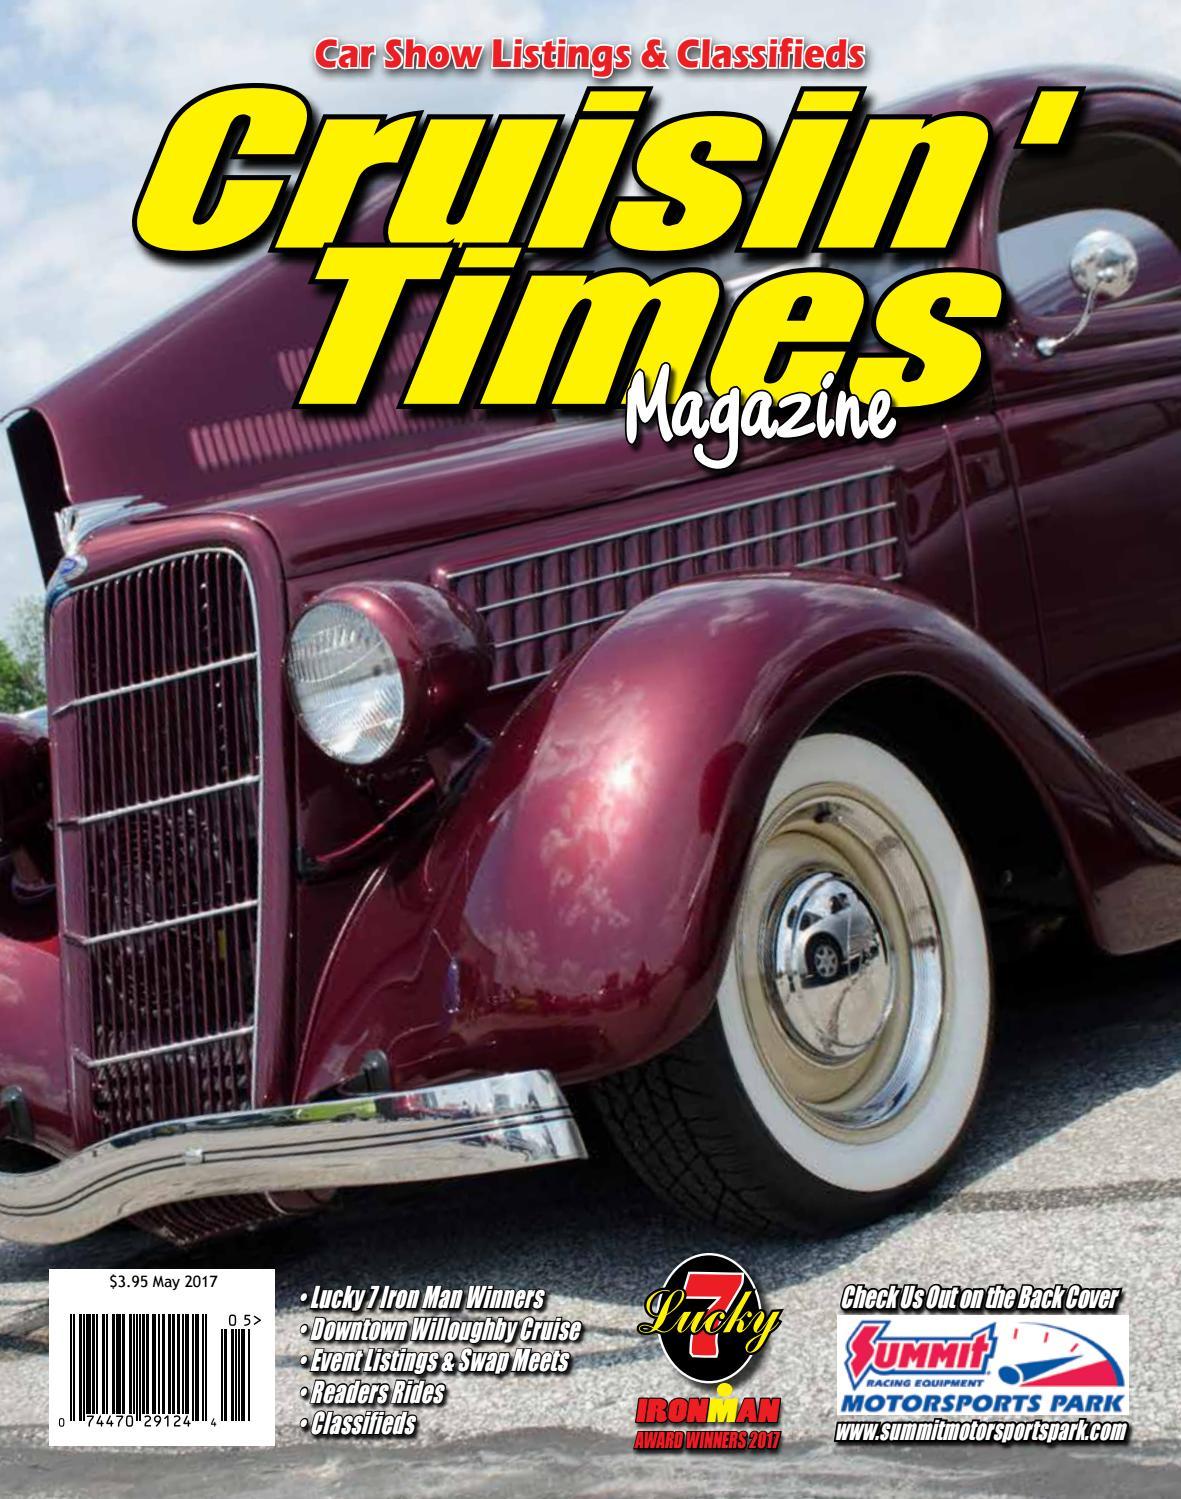 Chevrolet Chevy GMC Truck Vintage Car Classic Car T-Shirt 0169 Ls